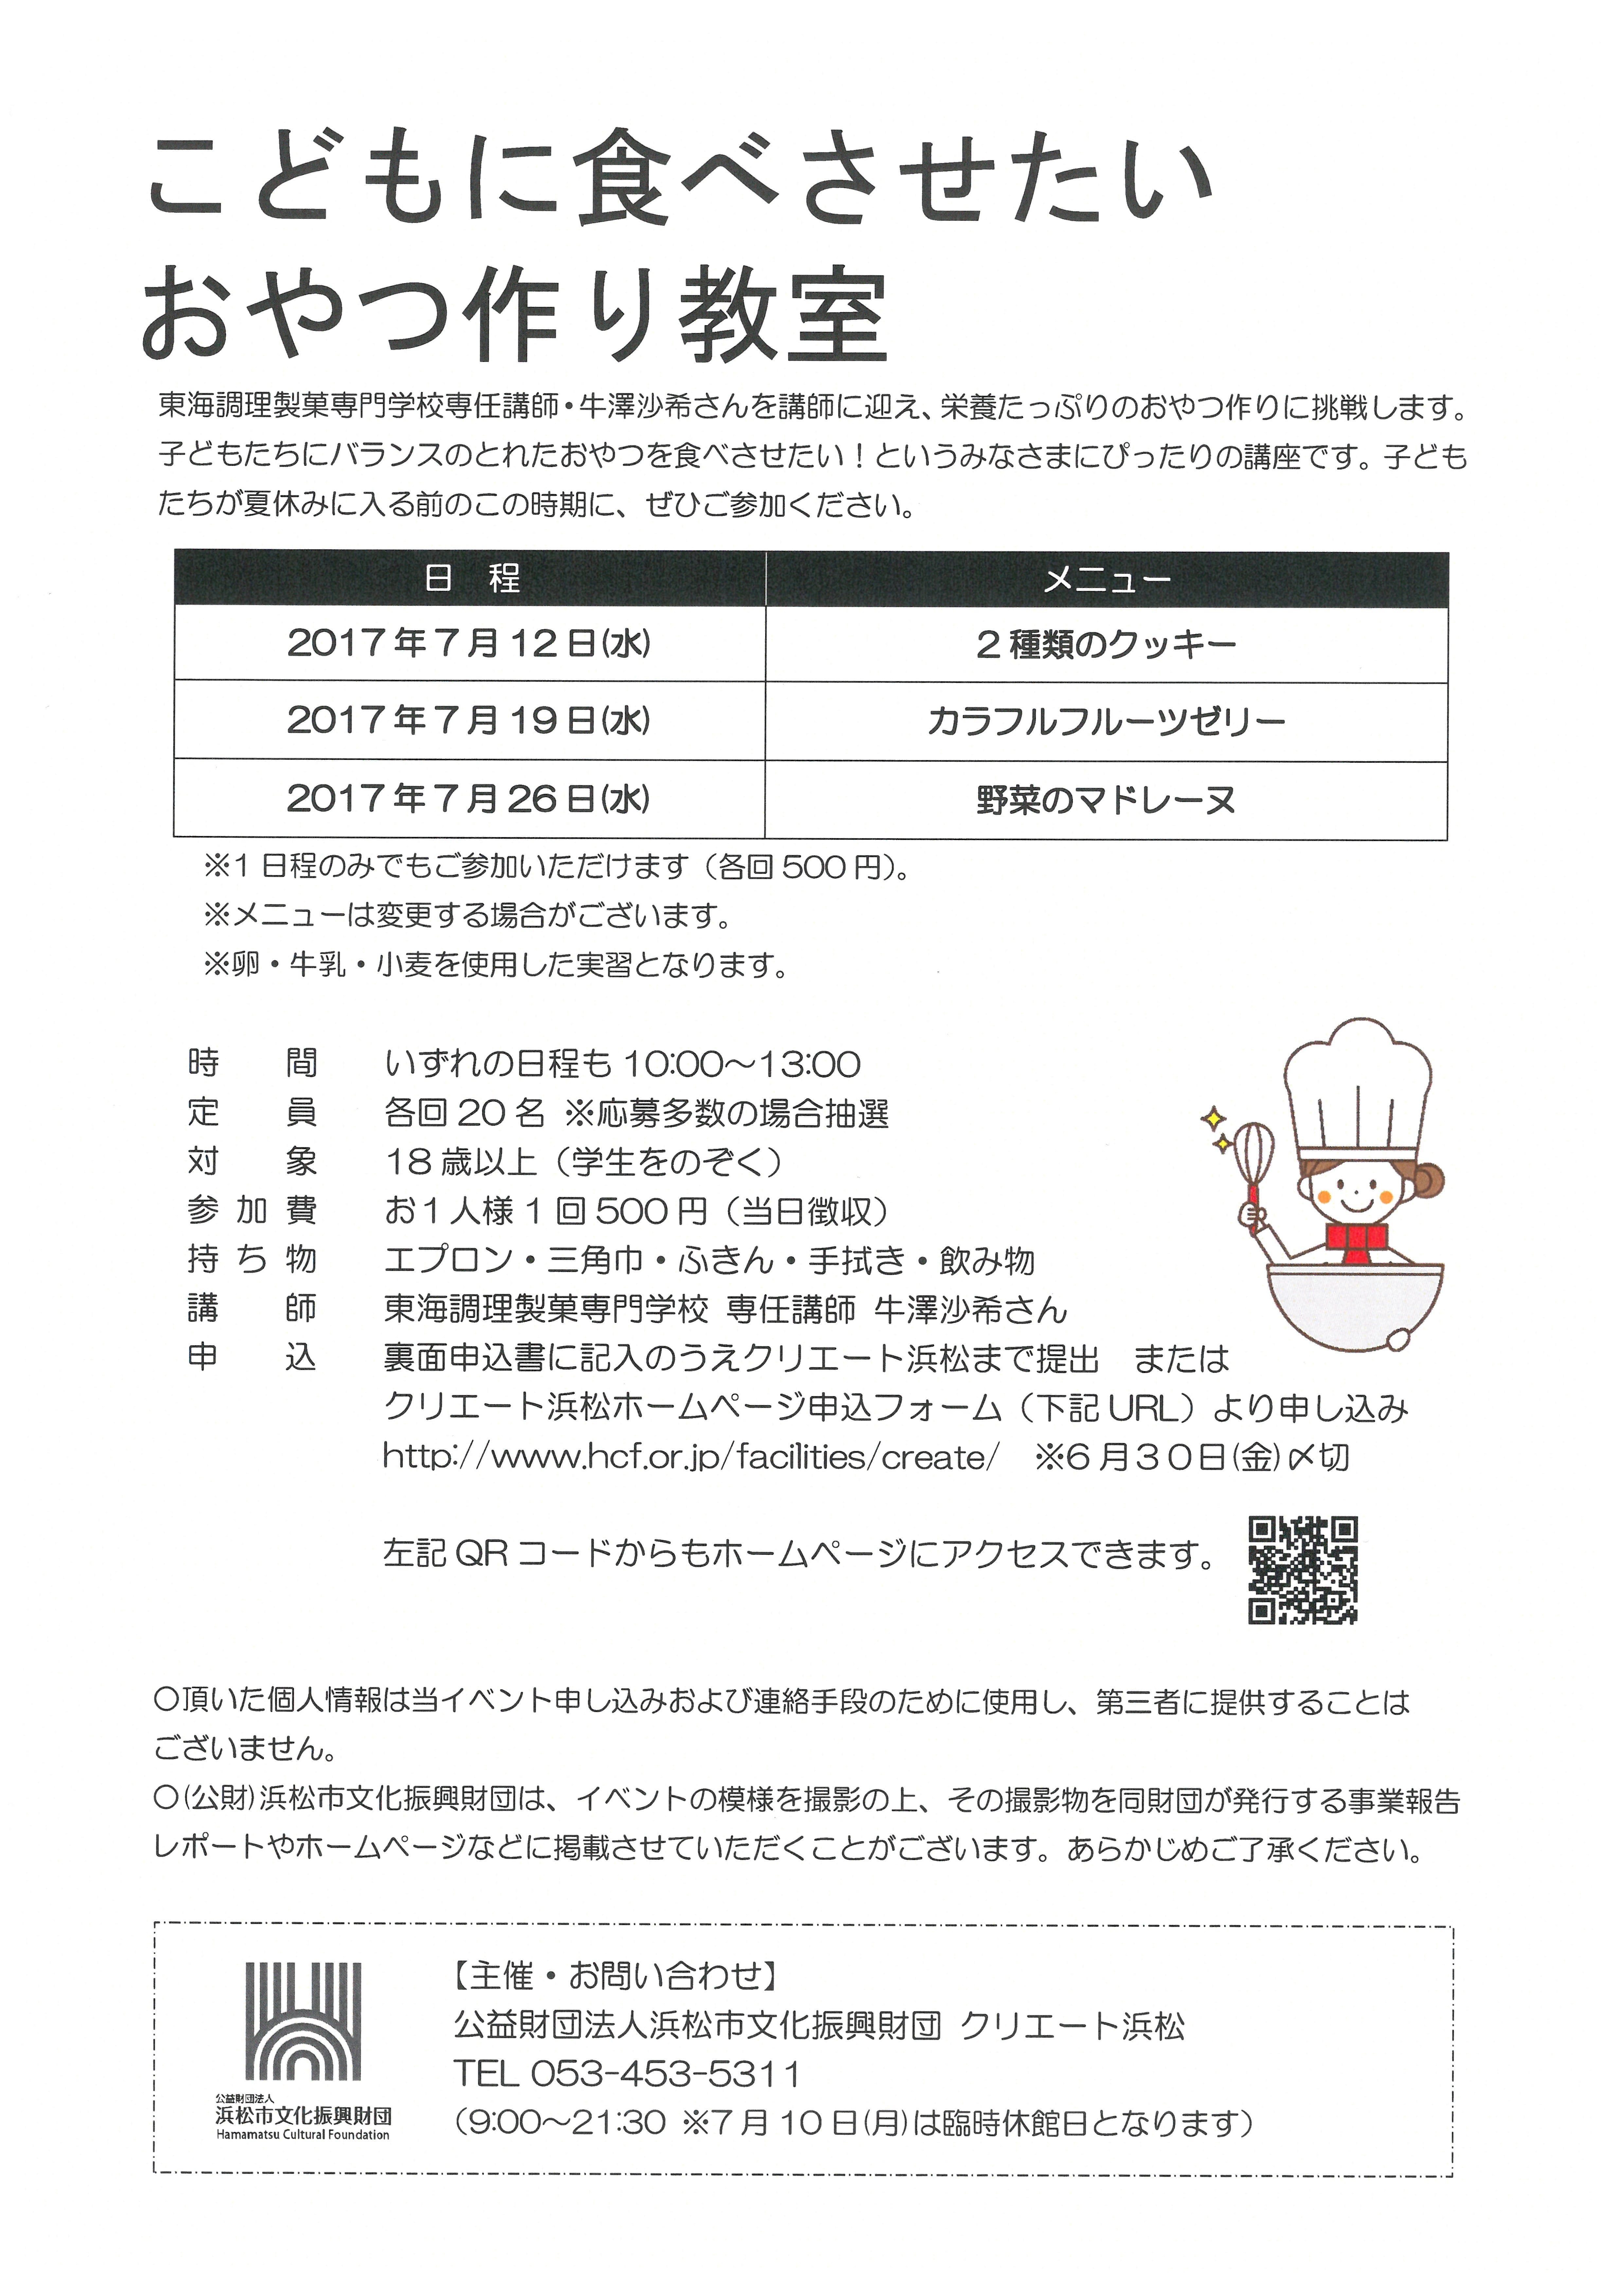 http://www.hcf.or.jp/facilities/create/project/kodomonoyatsudukuri.jpg